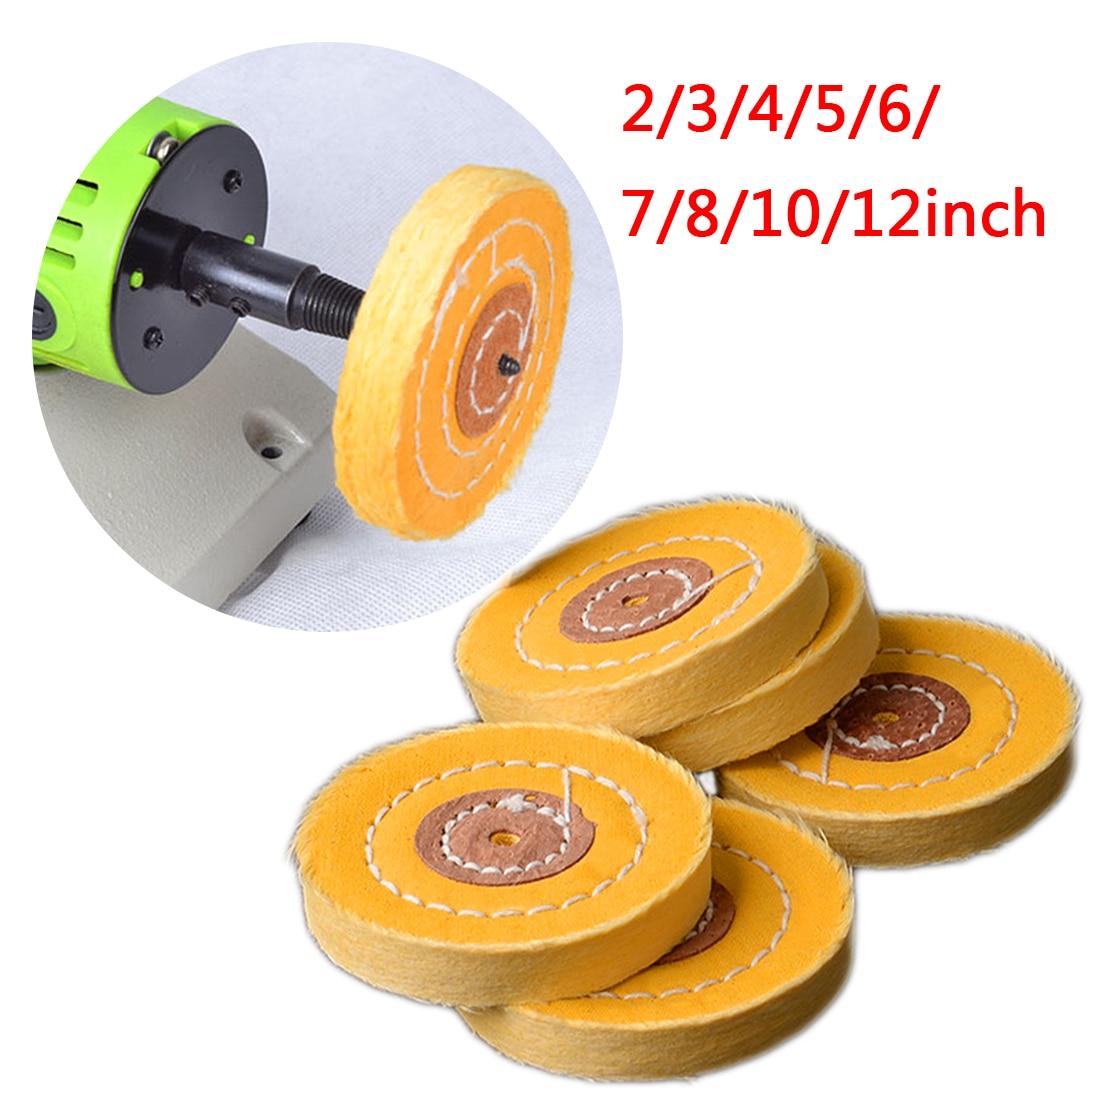 4mm Inner Diameter 50-300mm Cotton Lint Cloth Buffing Wheel Gold Silver Jewelry Mirror Hardware Polishing Wheel Tool Yellow